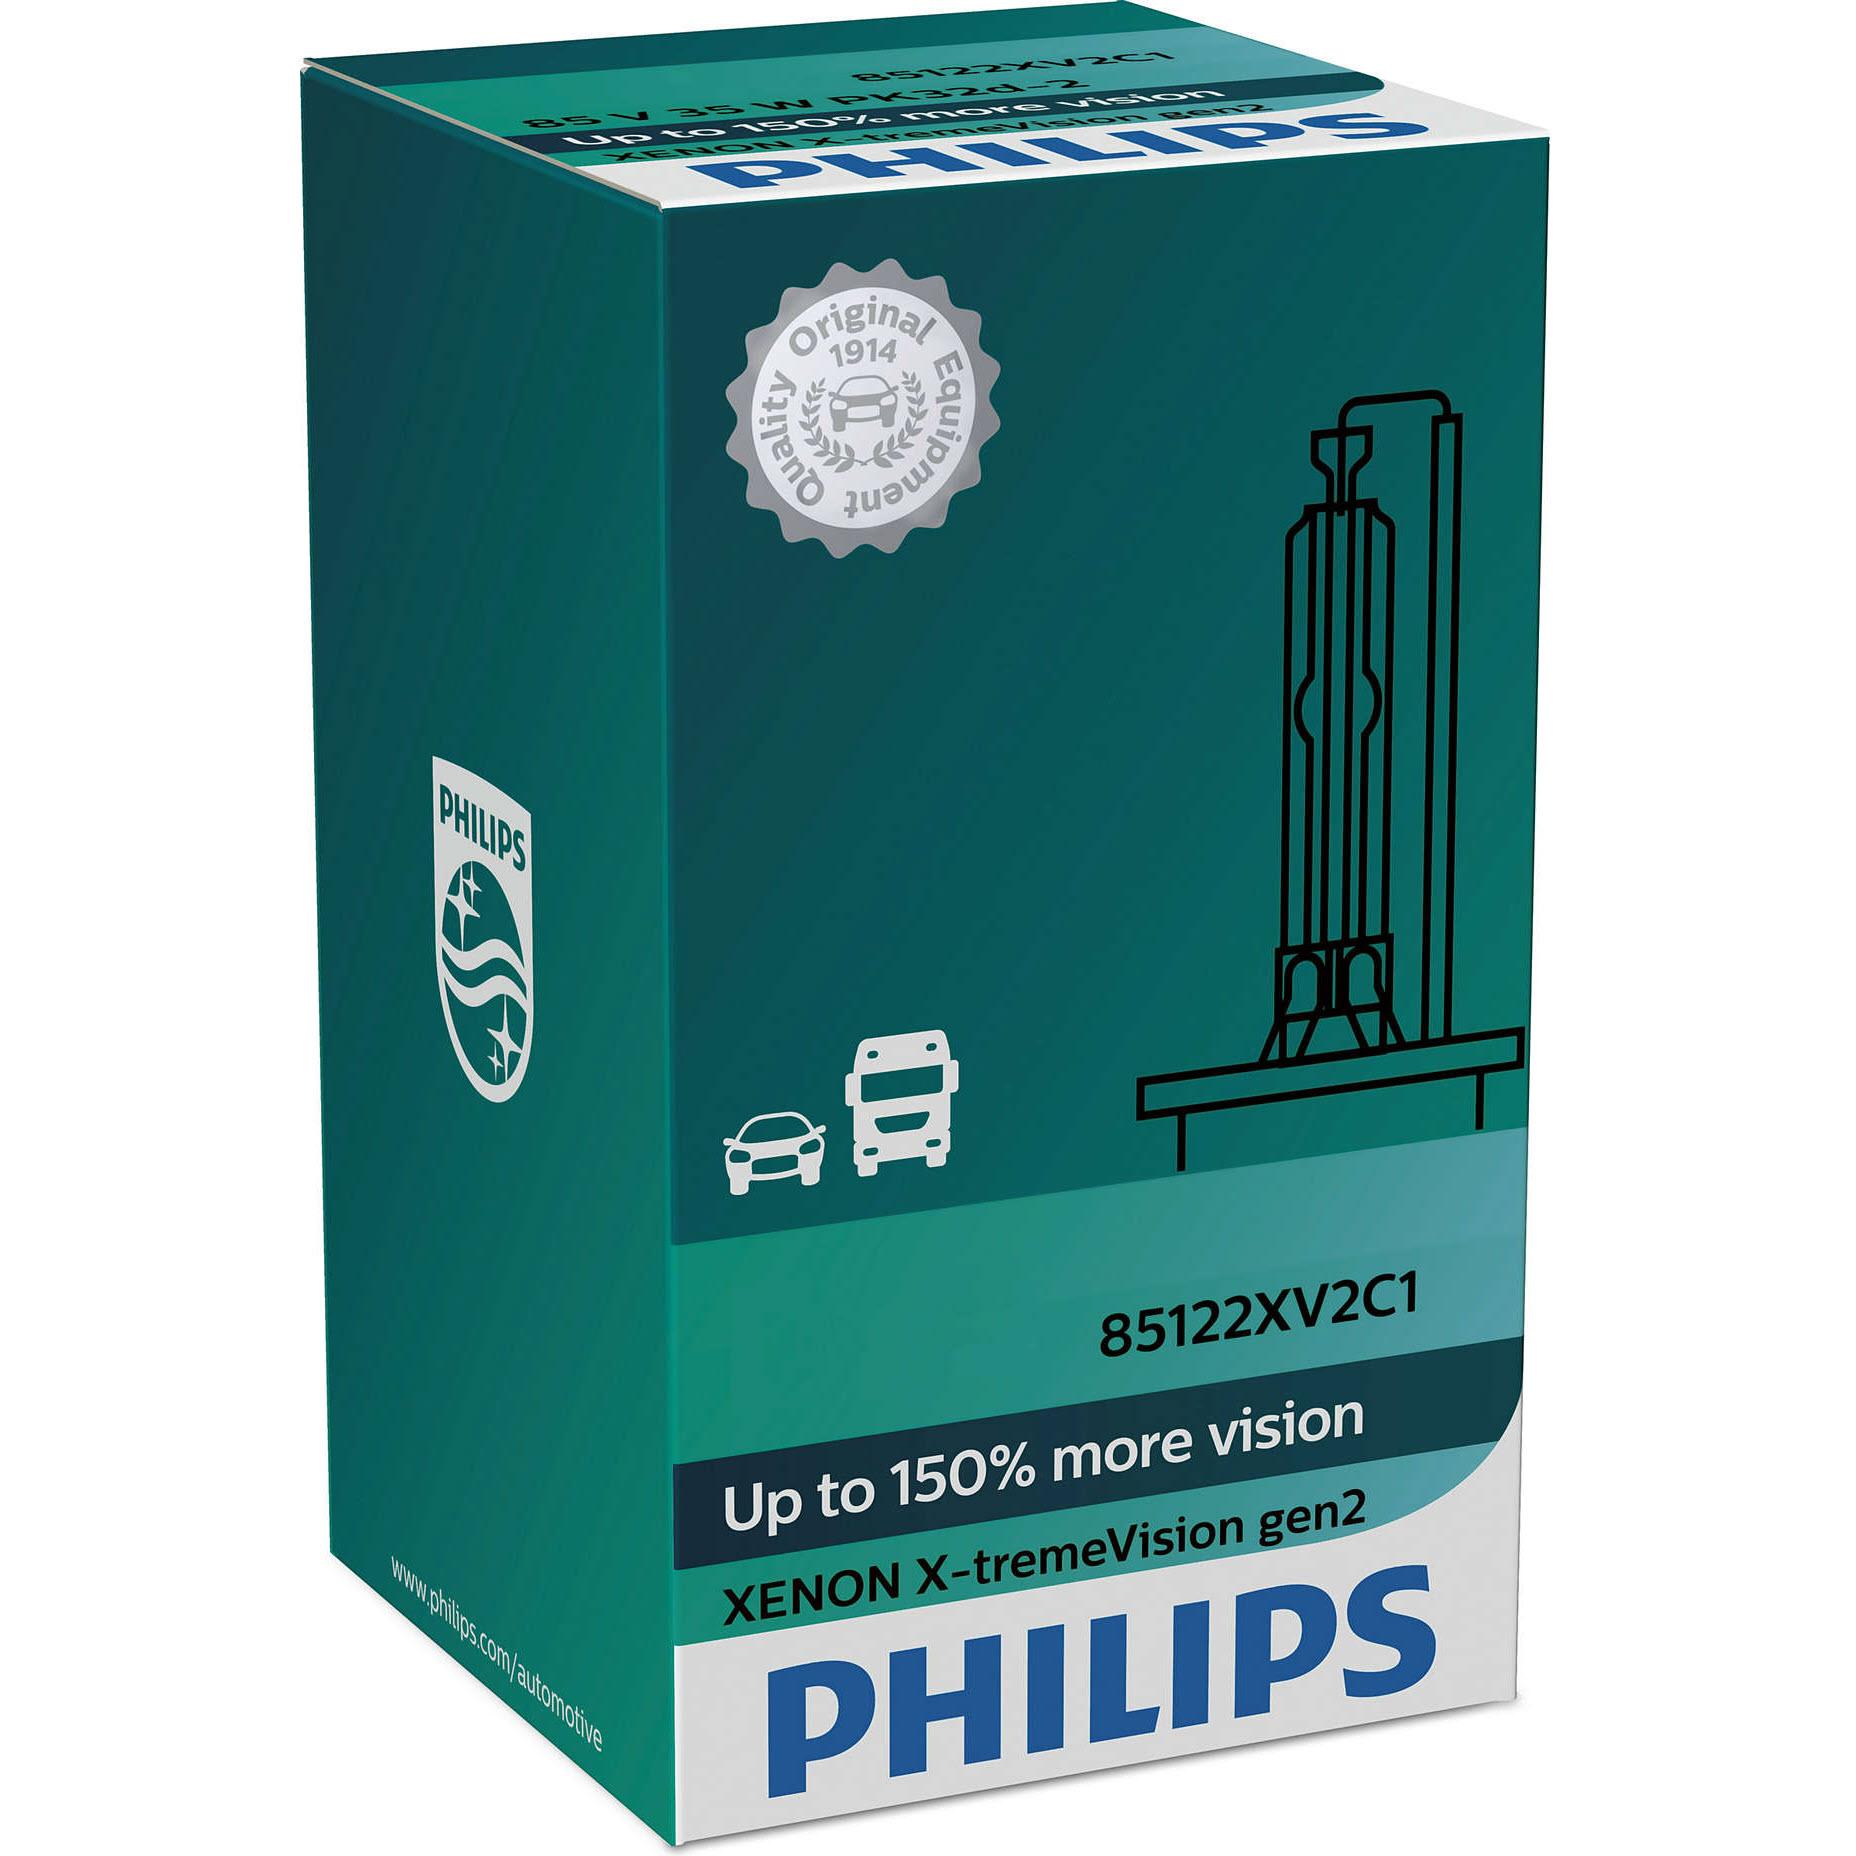 Philips D2R Xenon X-treme Vision +150% New! Gen2 +150% more vision (1 bulb)